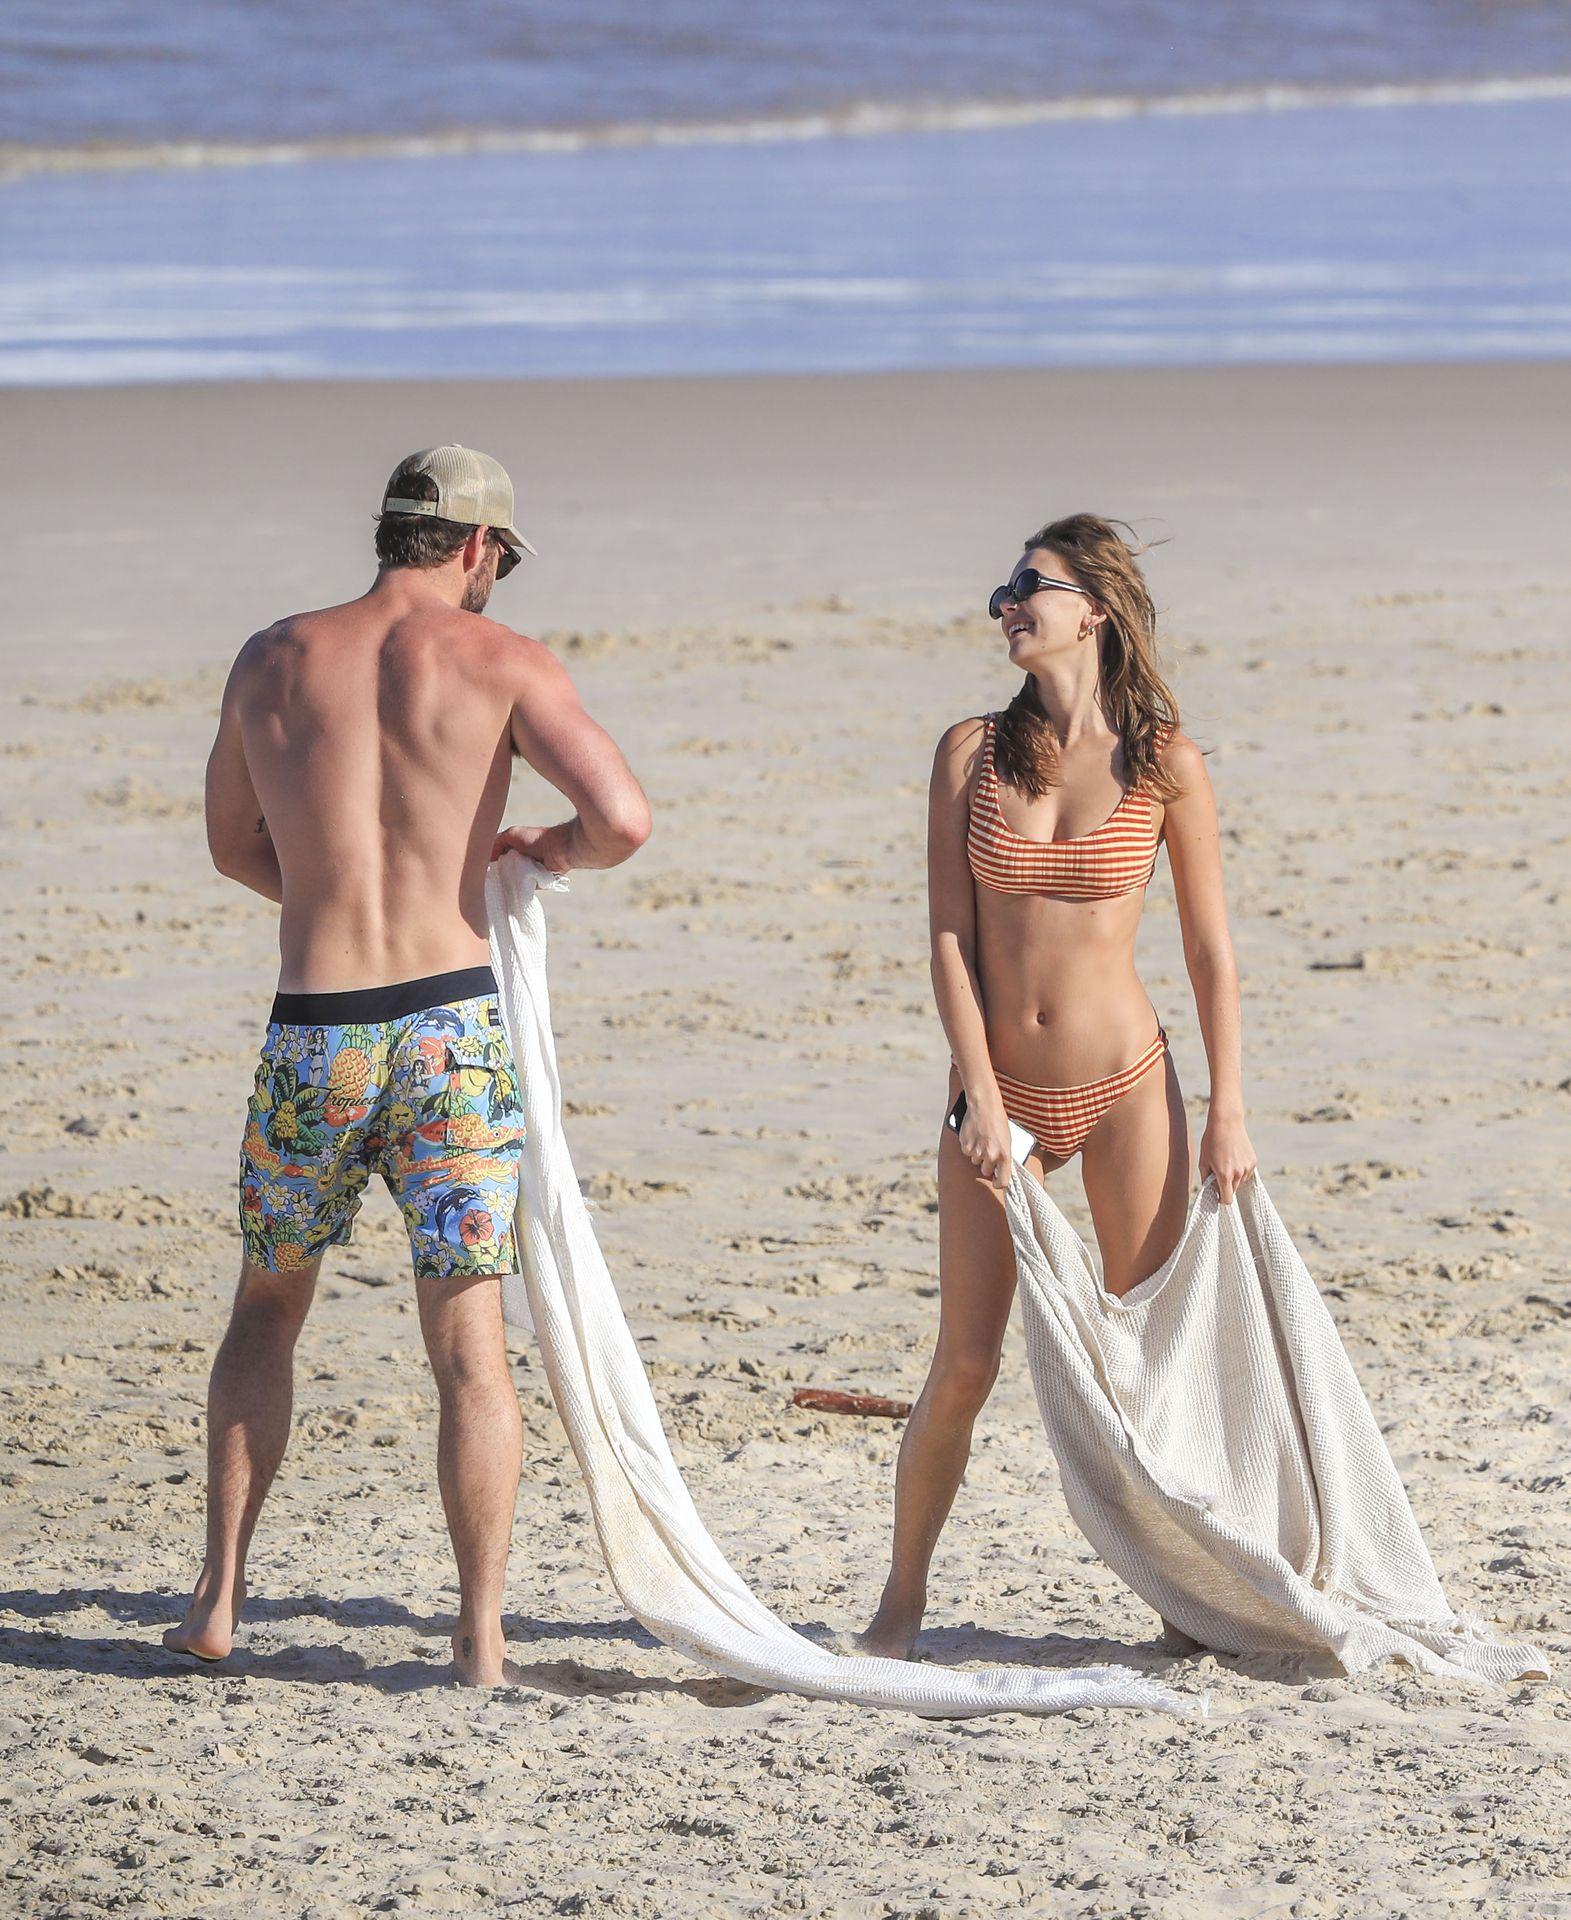 Gabriella Brooks Hot – Liam Hemsworth's New Girlfriend 0059